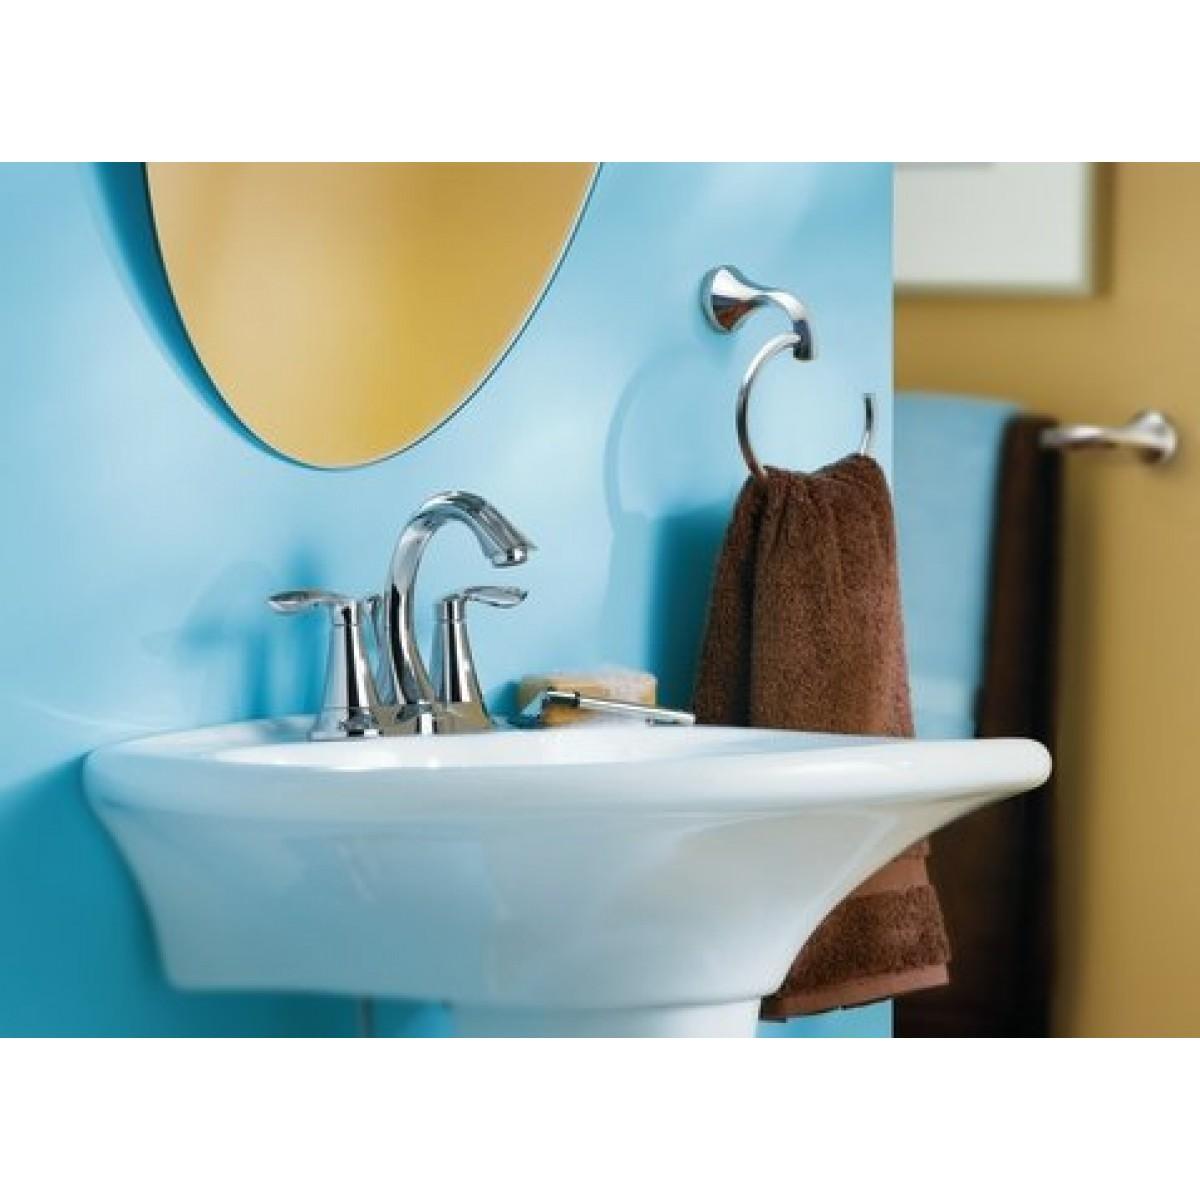 Moen Undermount Bathroom Sink moen eva centerset lead free 3 hole high arc bathroom faucet